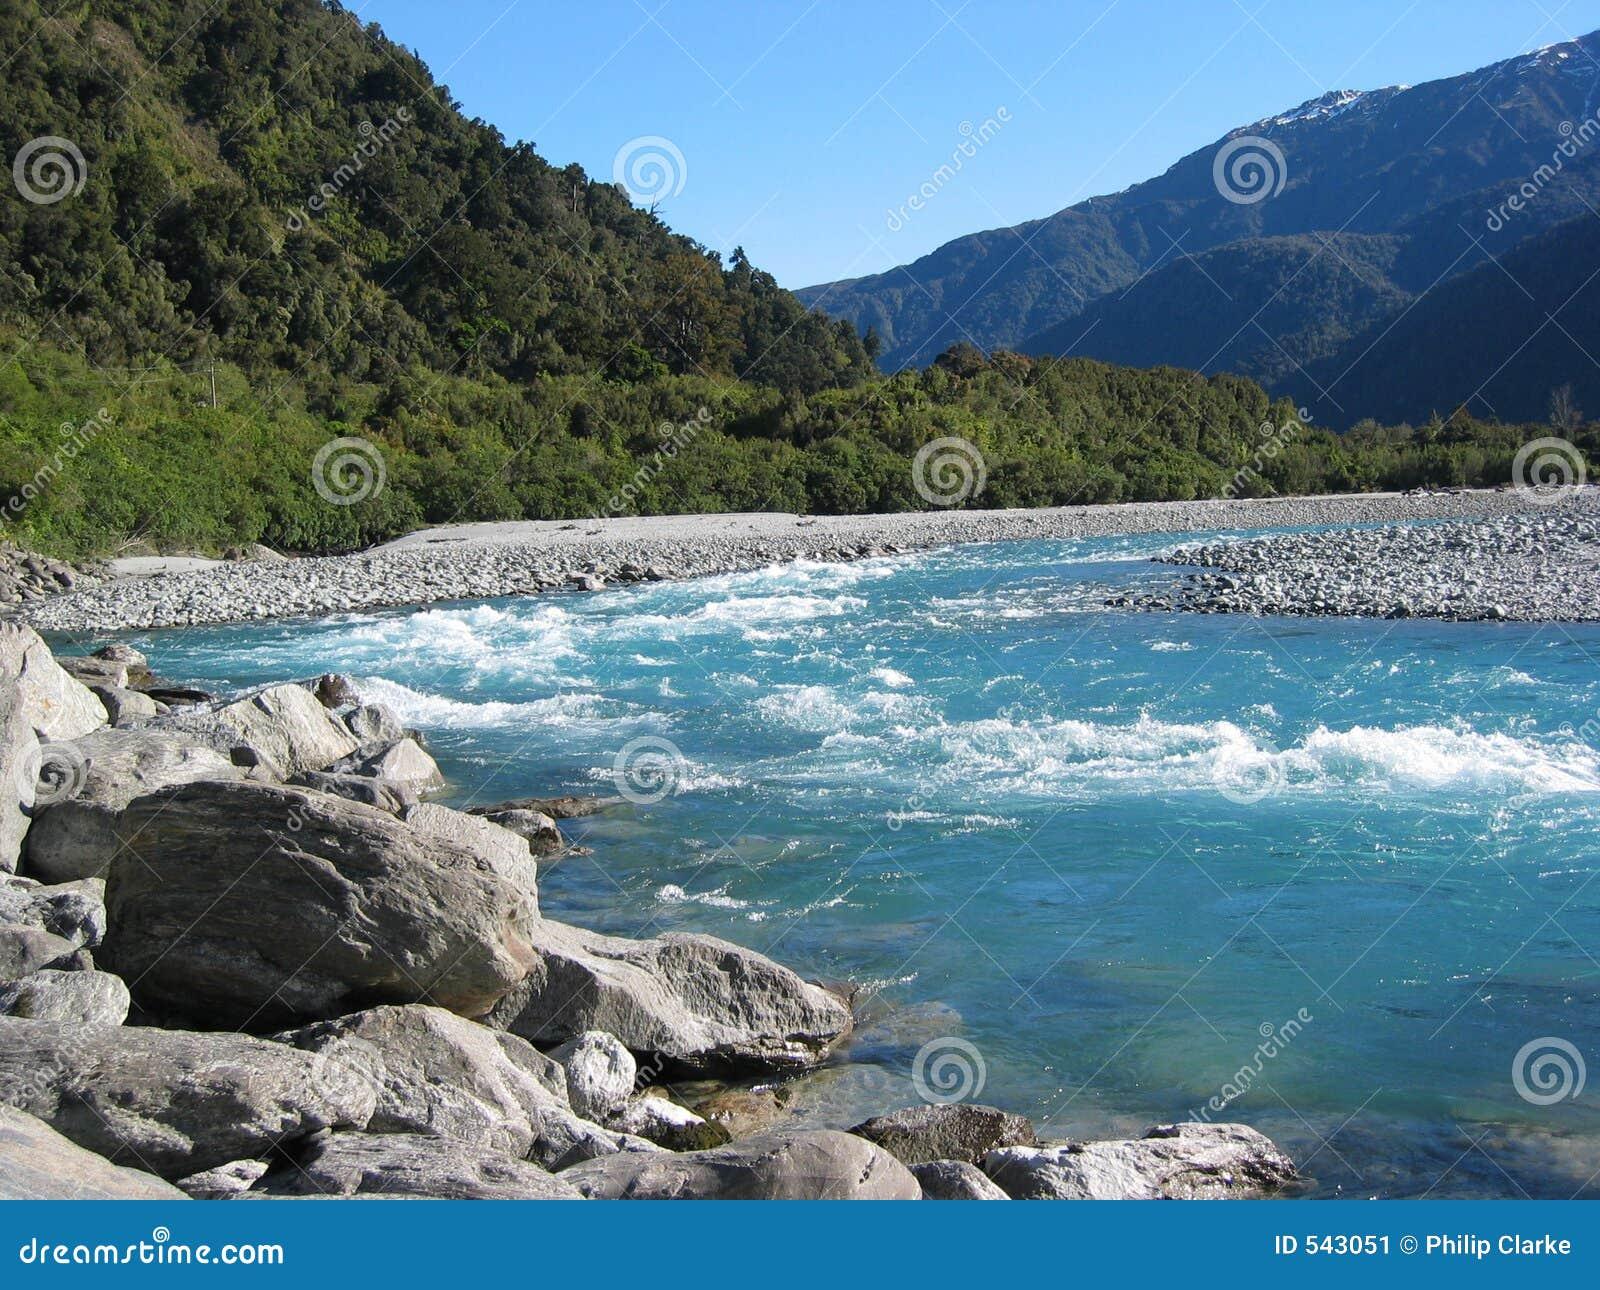 New Zealand Time Image: New Zealand River Stock Image. Image Of Blue, Rocks, River